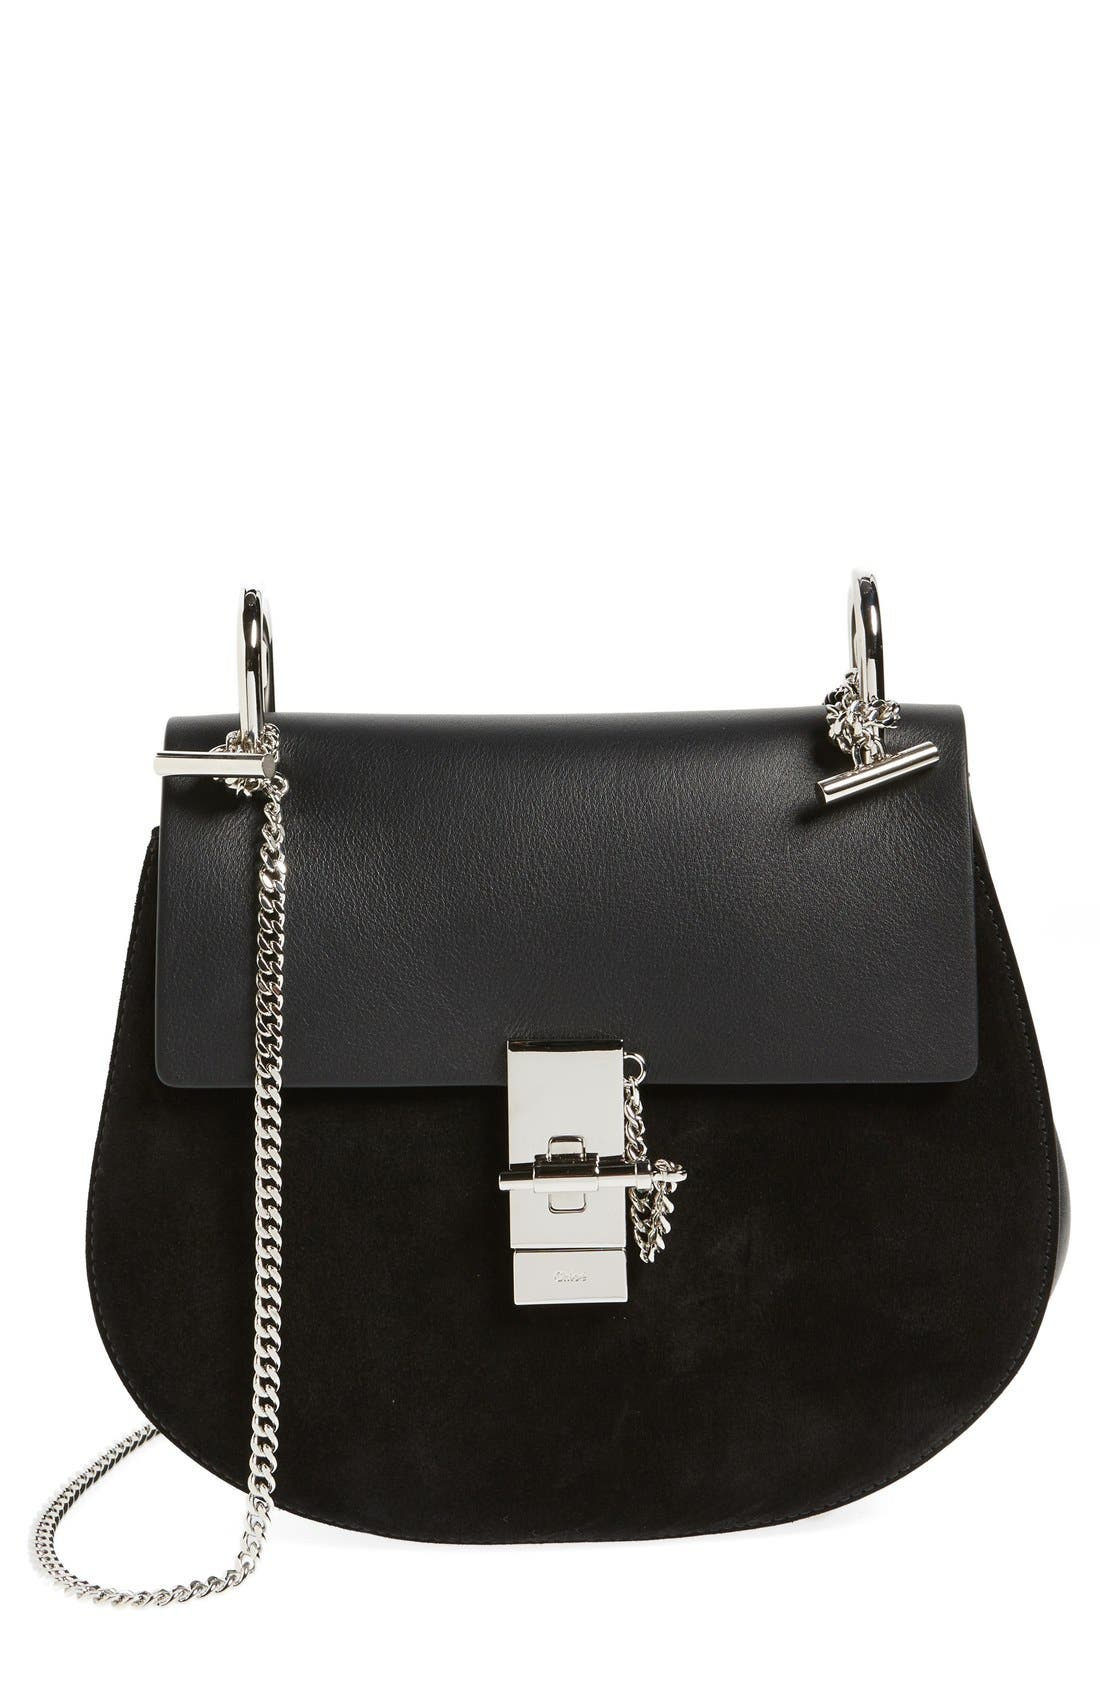 CHLOÉ, Small Drew Leather & Suede Shoulder Bag, Main thumbnail 1, color, 001